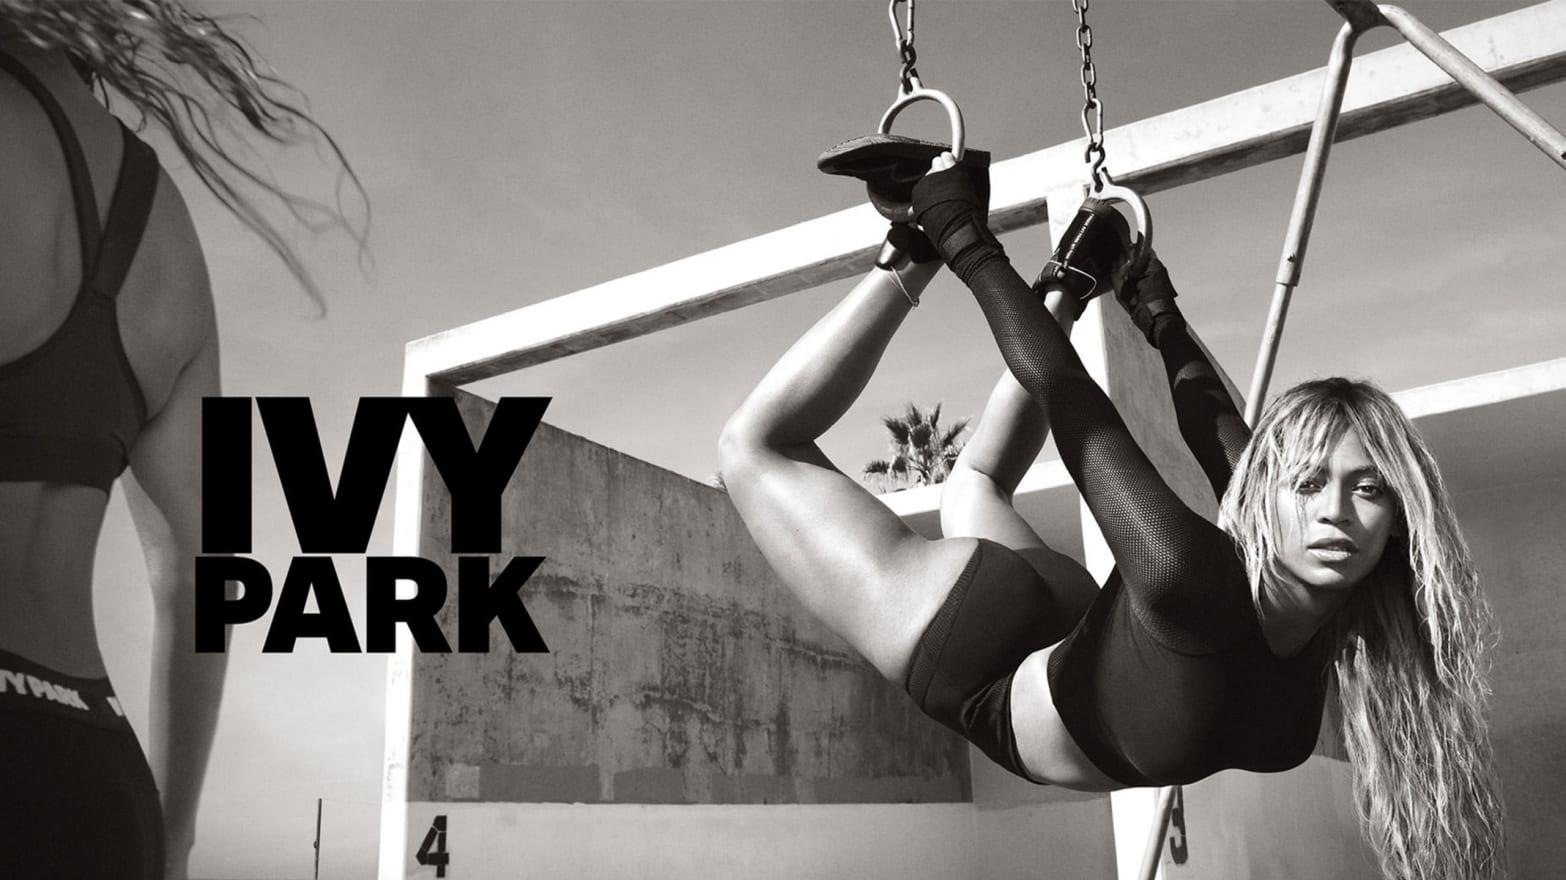 f0d9d2e431724 Beyonce's Workout Fashion Line Can Make Us Stronger